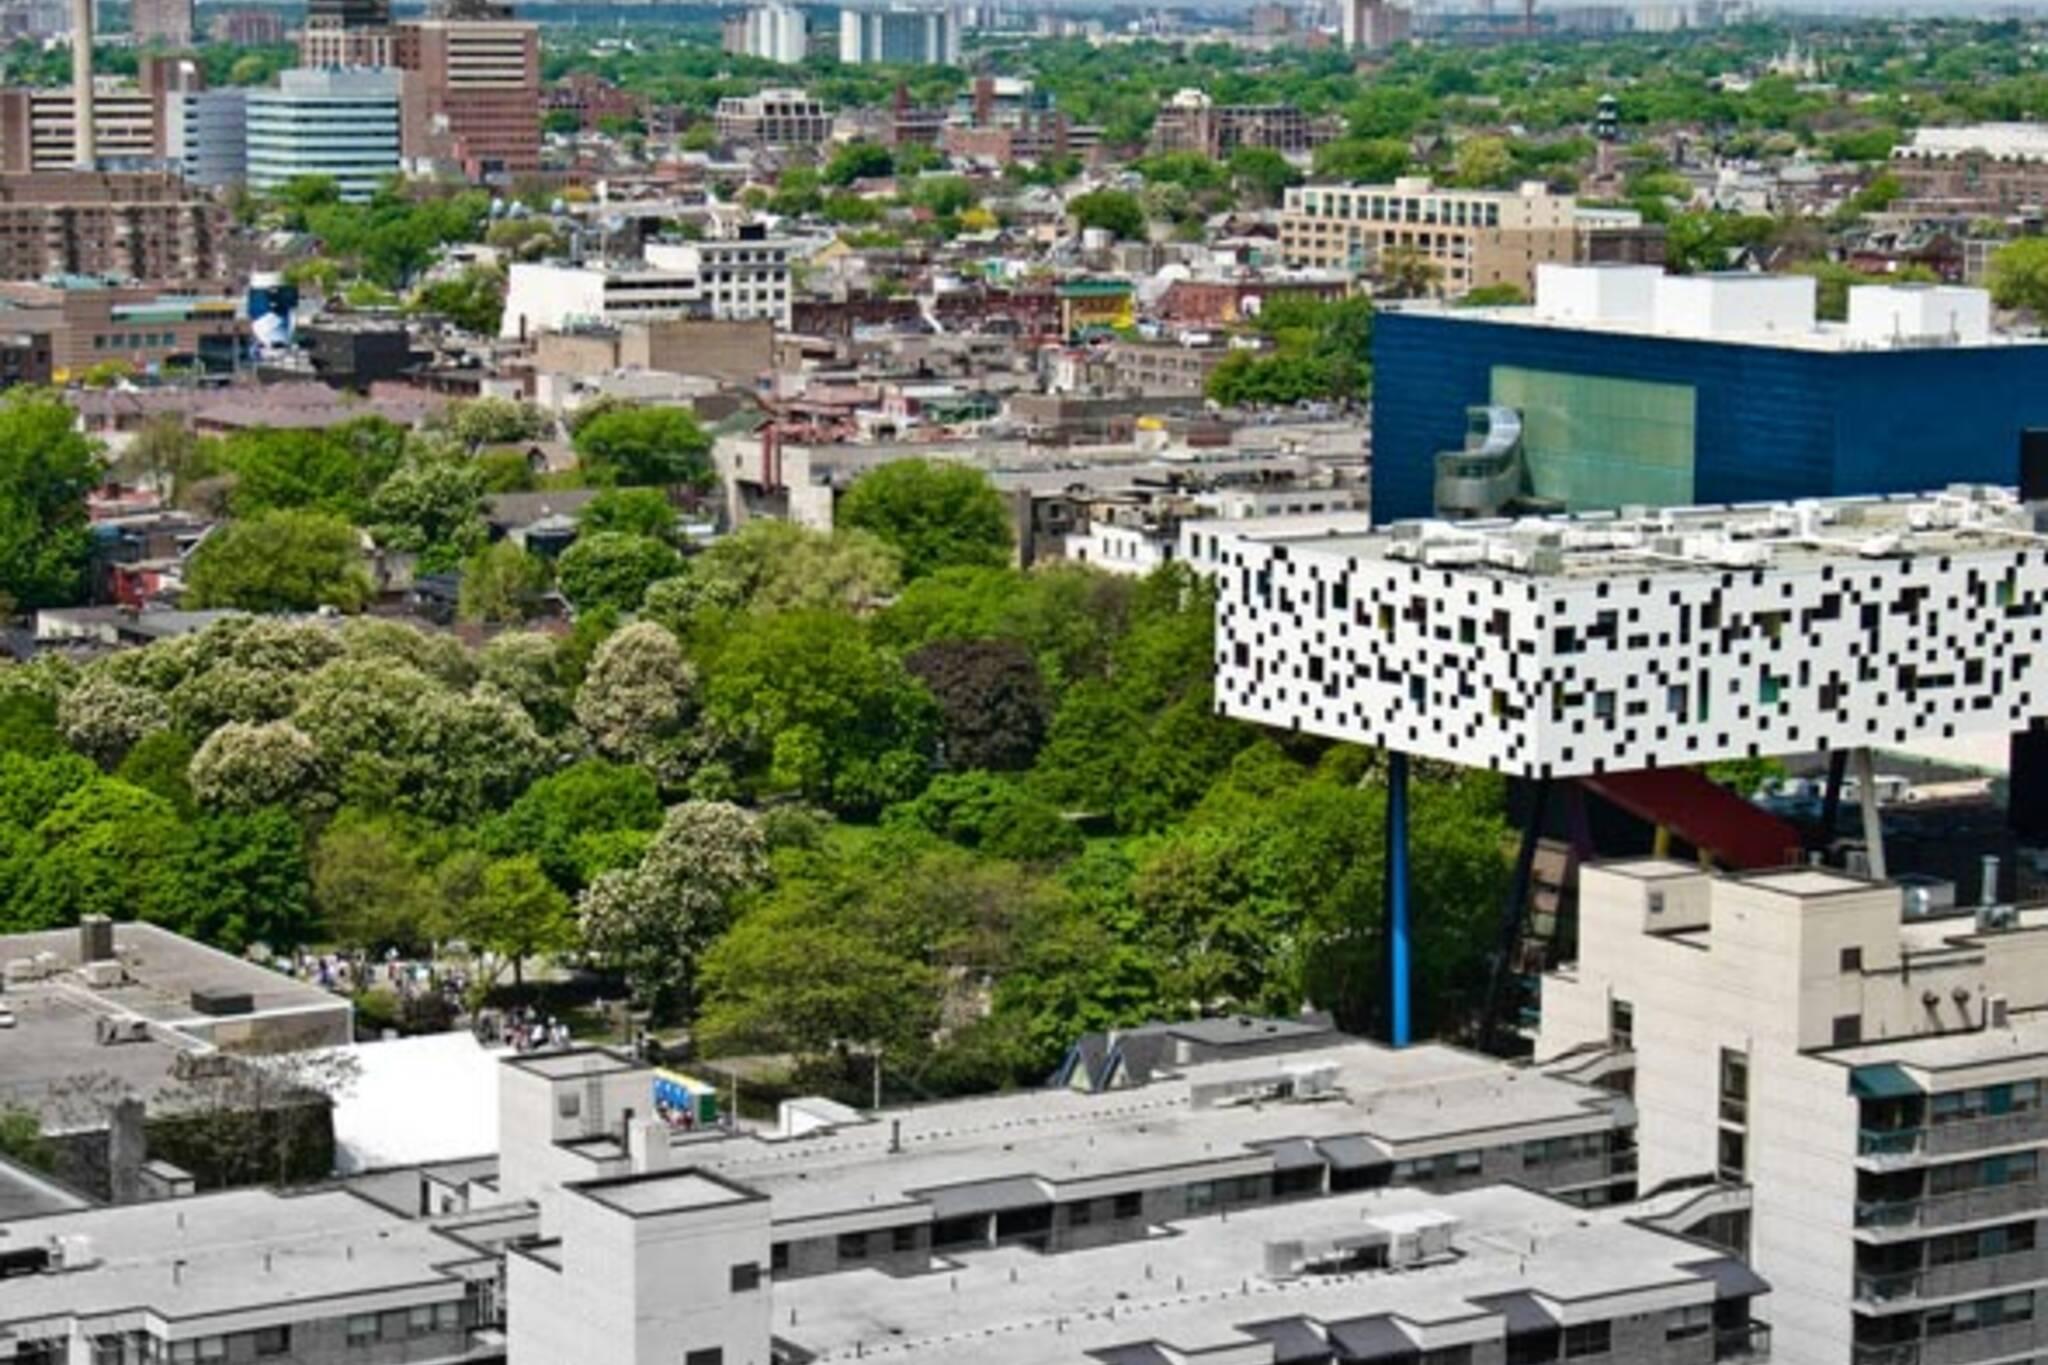 Canada Life building